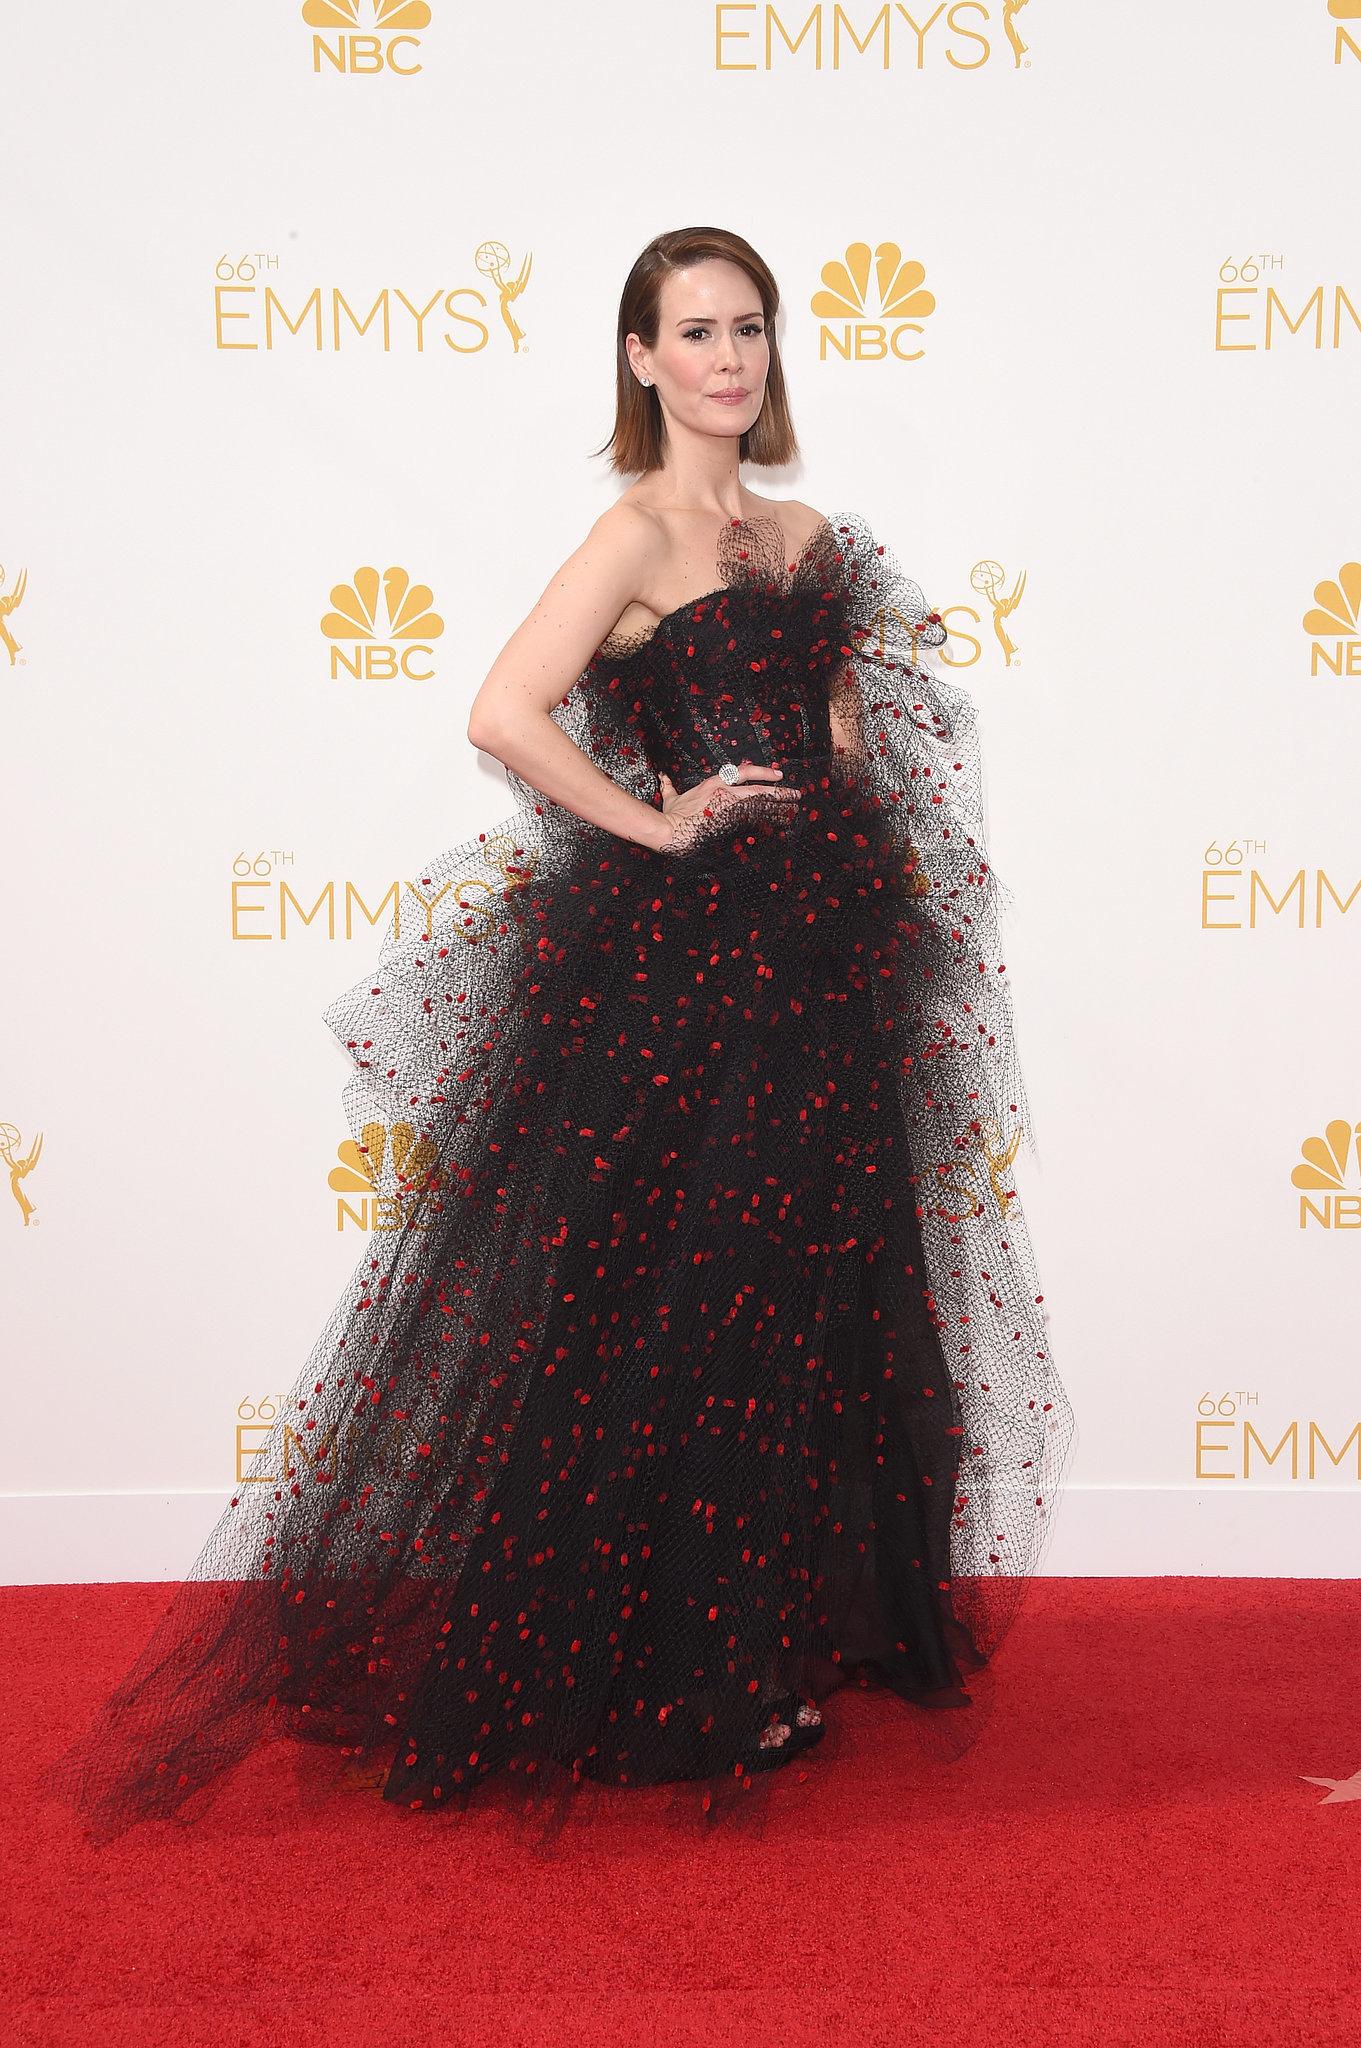 Sarah Paulson in Armani at the 2014 Emmy Awards